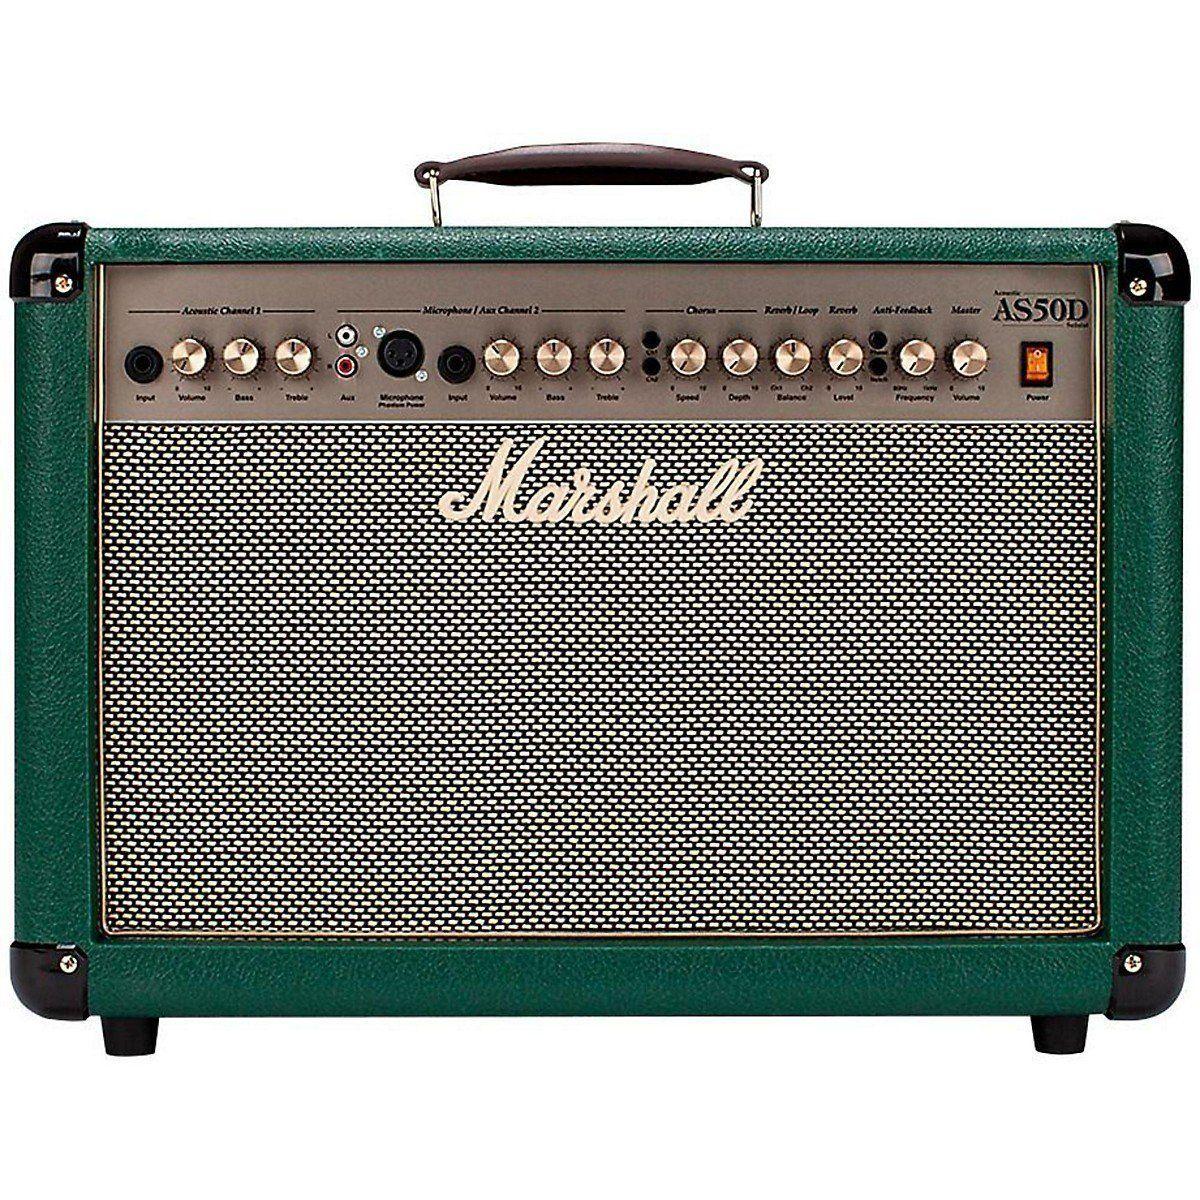 Rainbow Music Marshall As50d Acoustic Guitar Amplifier Green 269 00 Http Www Rainbowmusic Co Uk Marshall As50d Acoustic Acoustic Guitar Guitar Acoustic